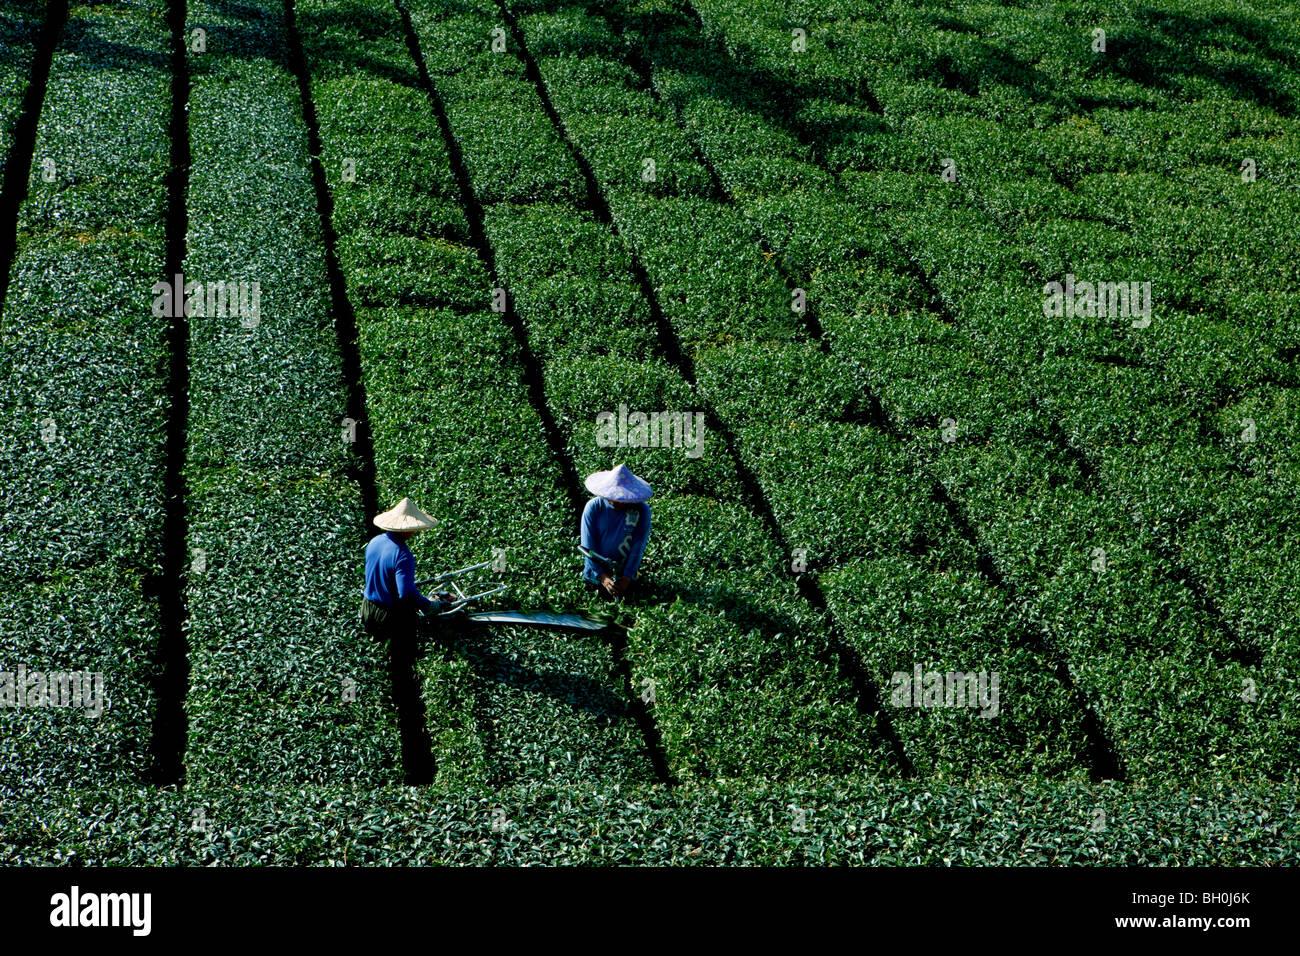 Tea farmers working on a tea plantation, Rueili, Alishan, Taiwan, Asia - Stock Image